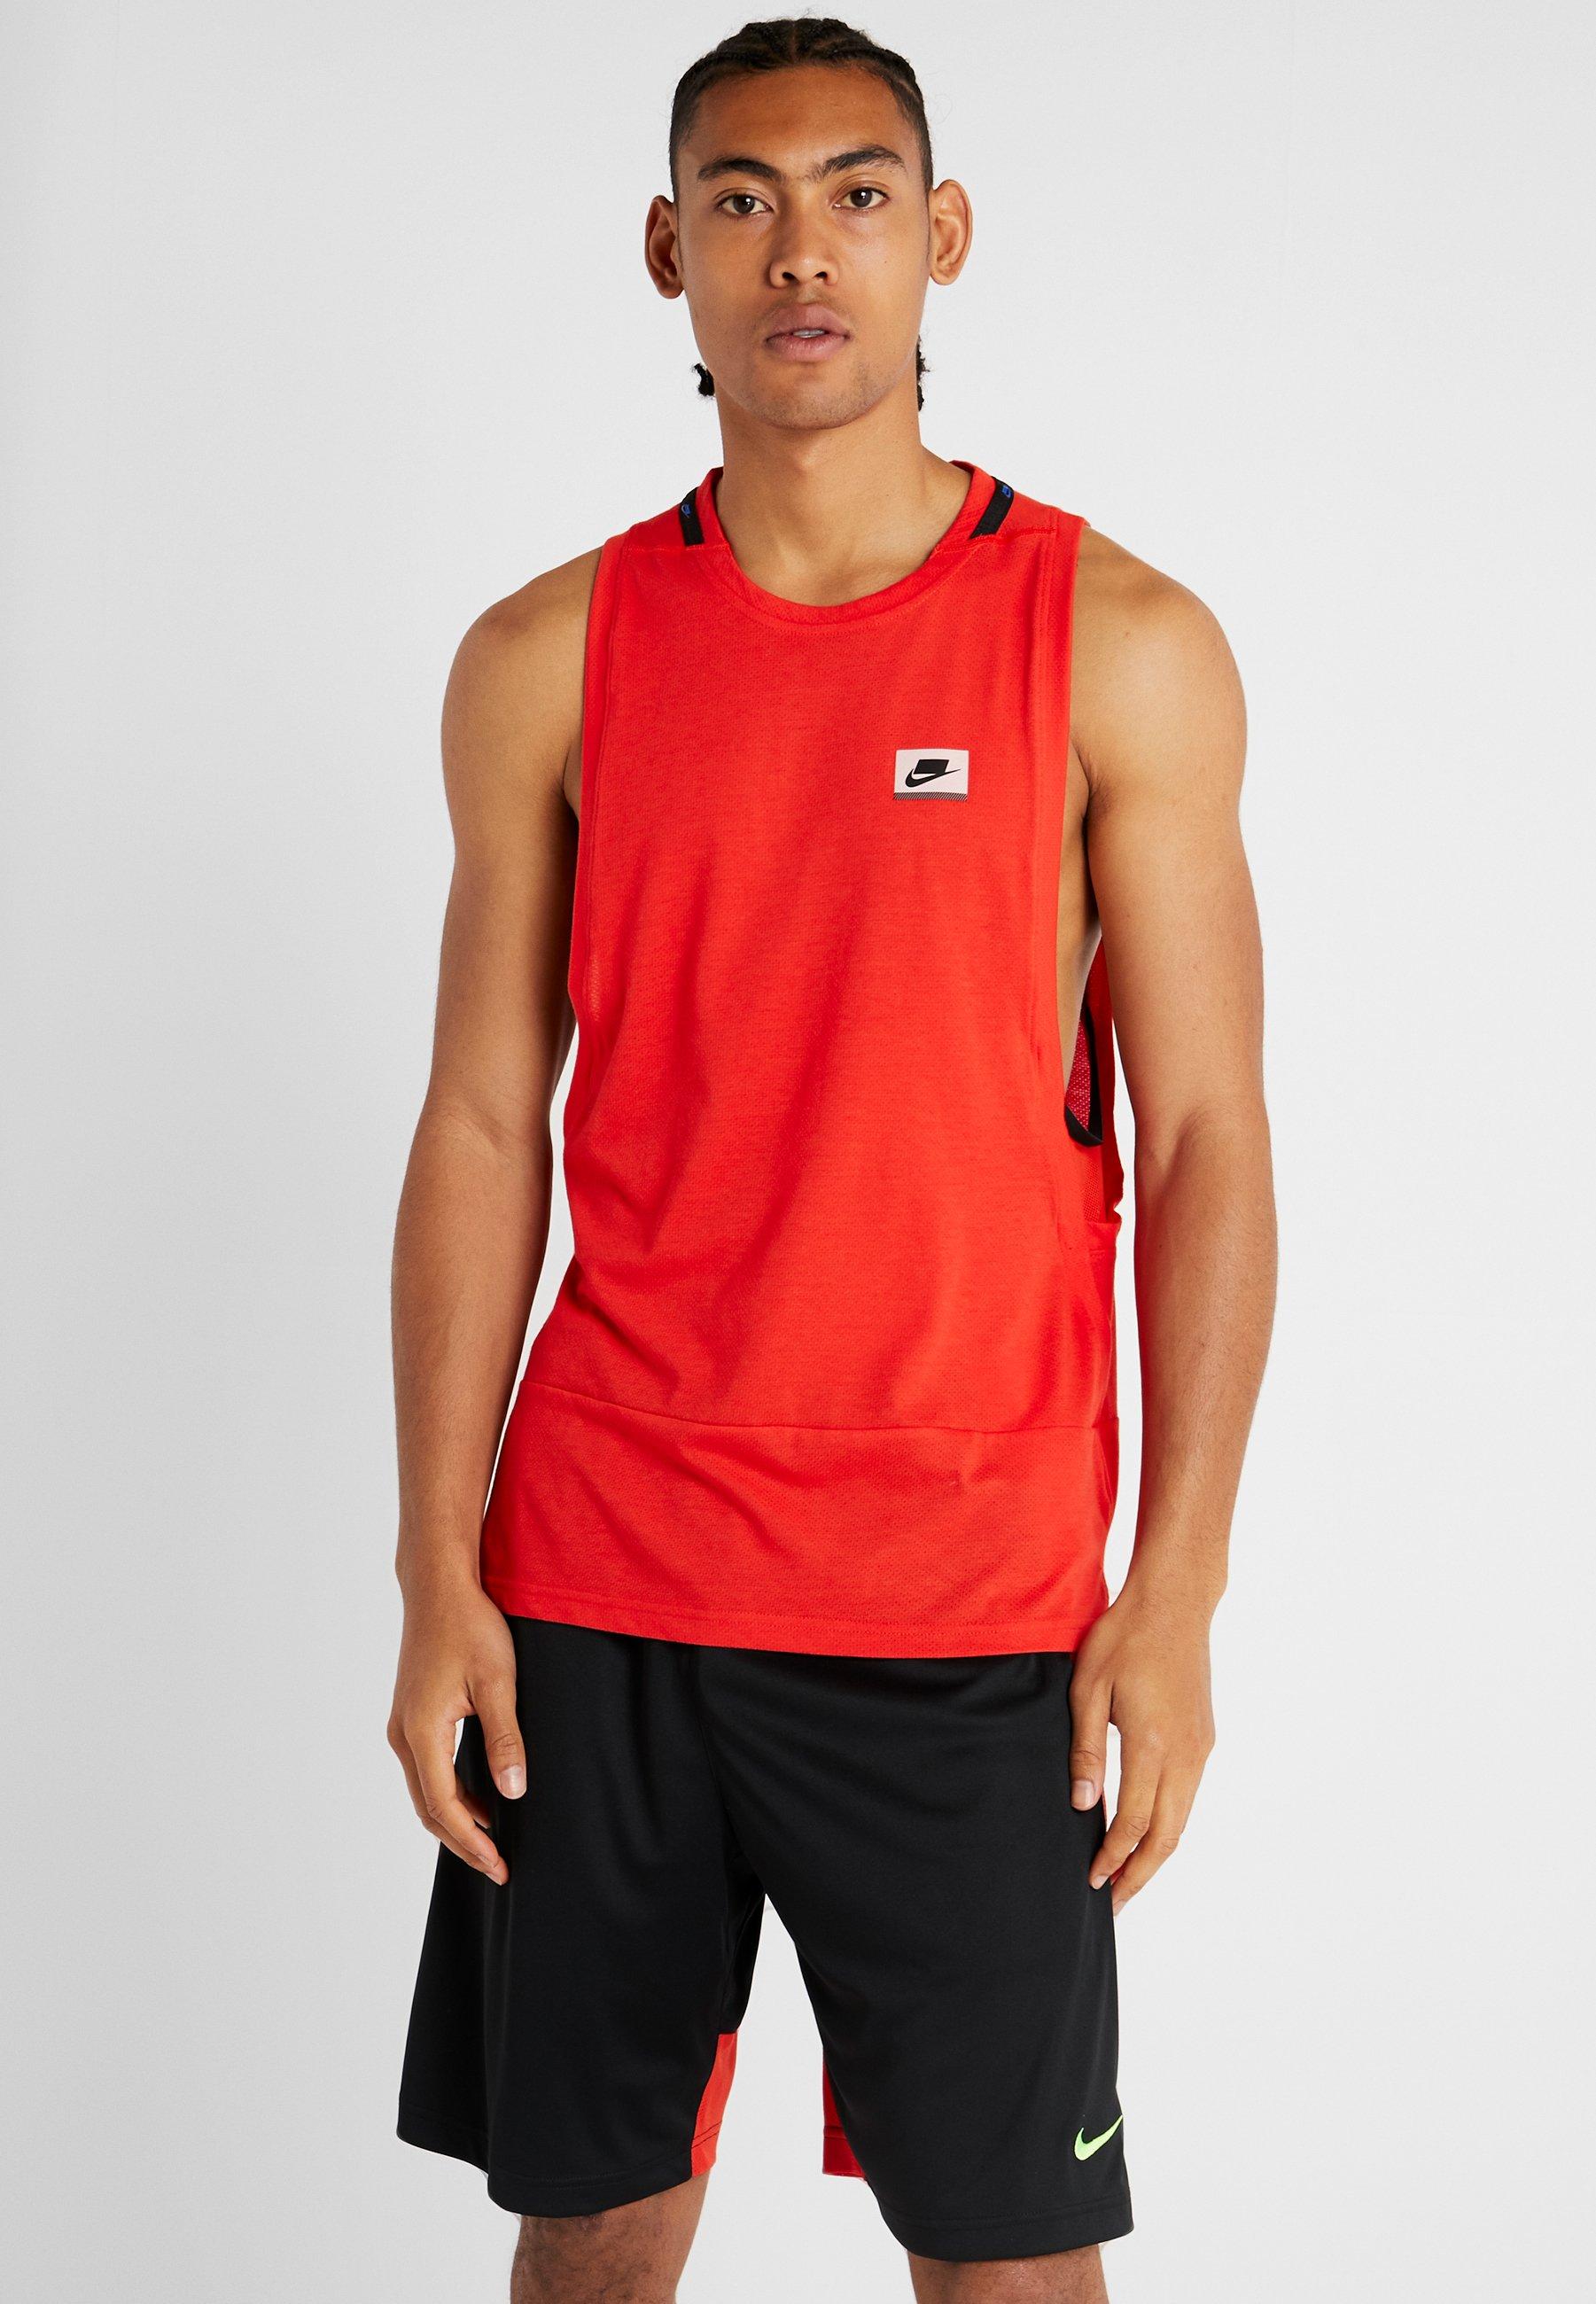 Nike game De black Performance shirt Habanero Sport Red Dry TankT Royal SpLzMqUVG